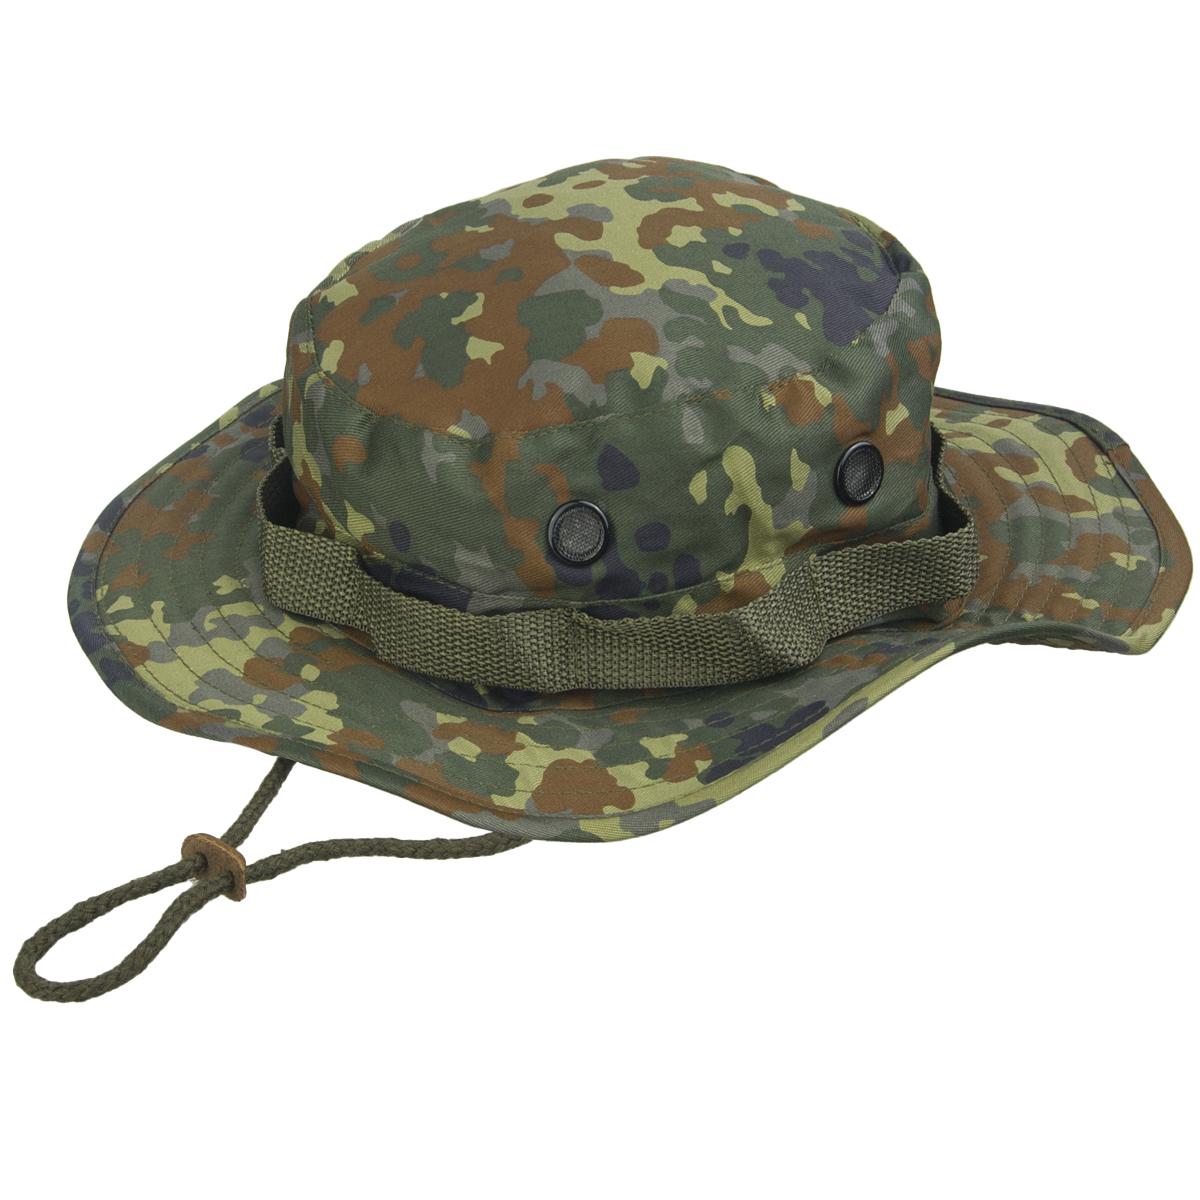 Sentinel Army Tactical Boonie Bush Jungle Hat Cap Fishing Hiking BW  Flecktarn Camo S-XXL 0b7ca0b316d